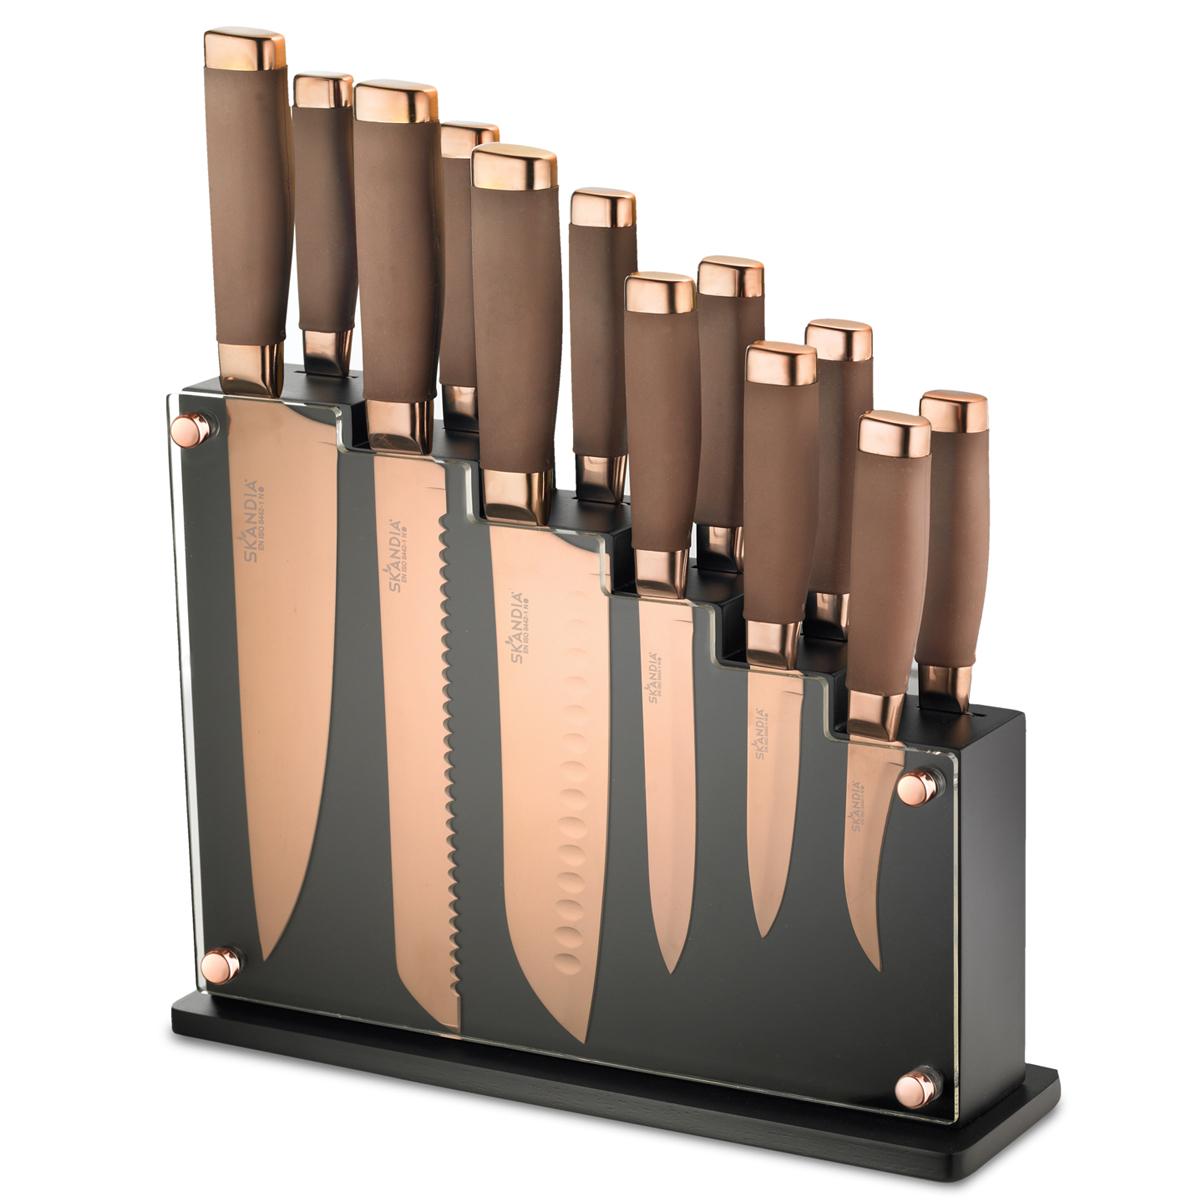 Hampton Forge Cutlery Set